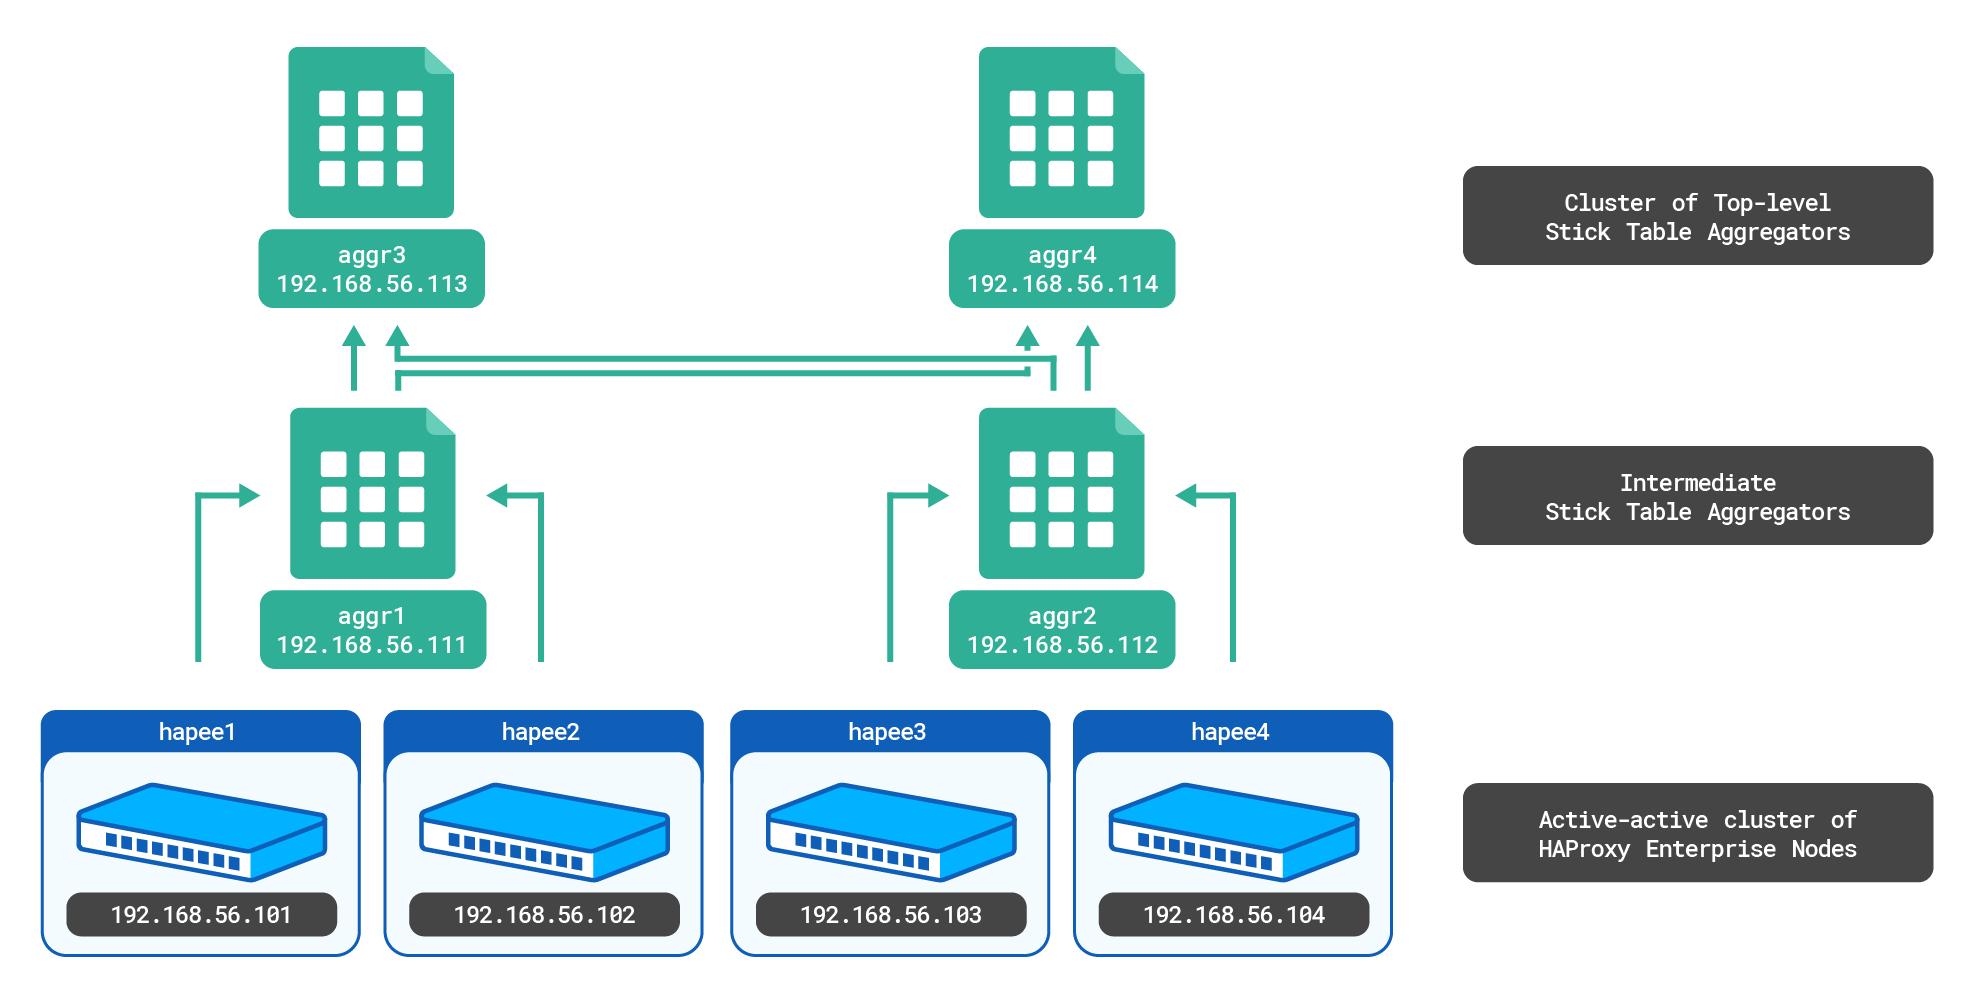 https://cdn.haproxy.com/documentation/hapee/latest/assets/cluster-wide-tracking-ha-setup-3e25d8ecf8c45676e4240bfd3064aa1f880aec0f81fe28afeaf9cd0516086fd7.png